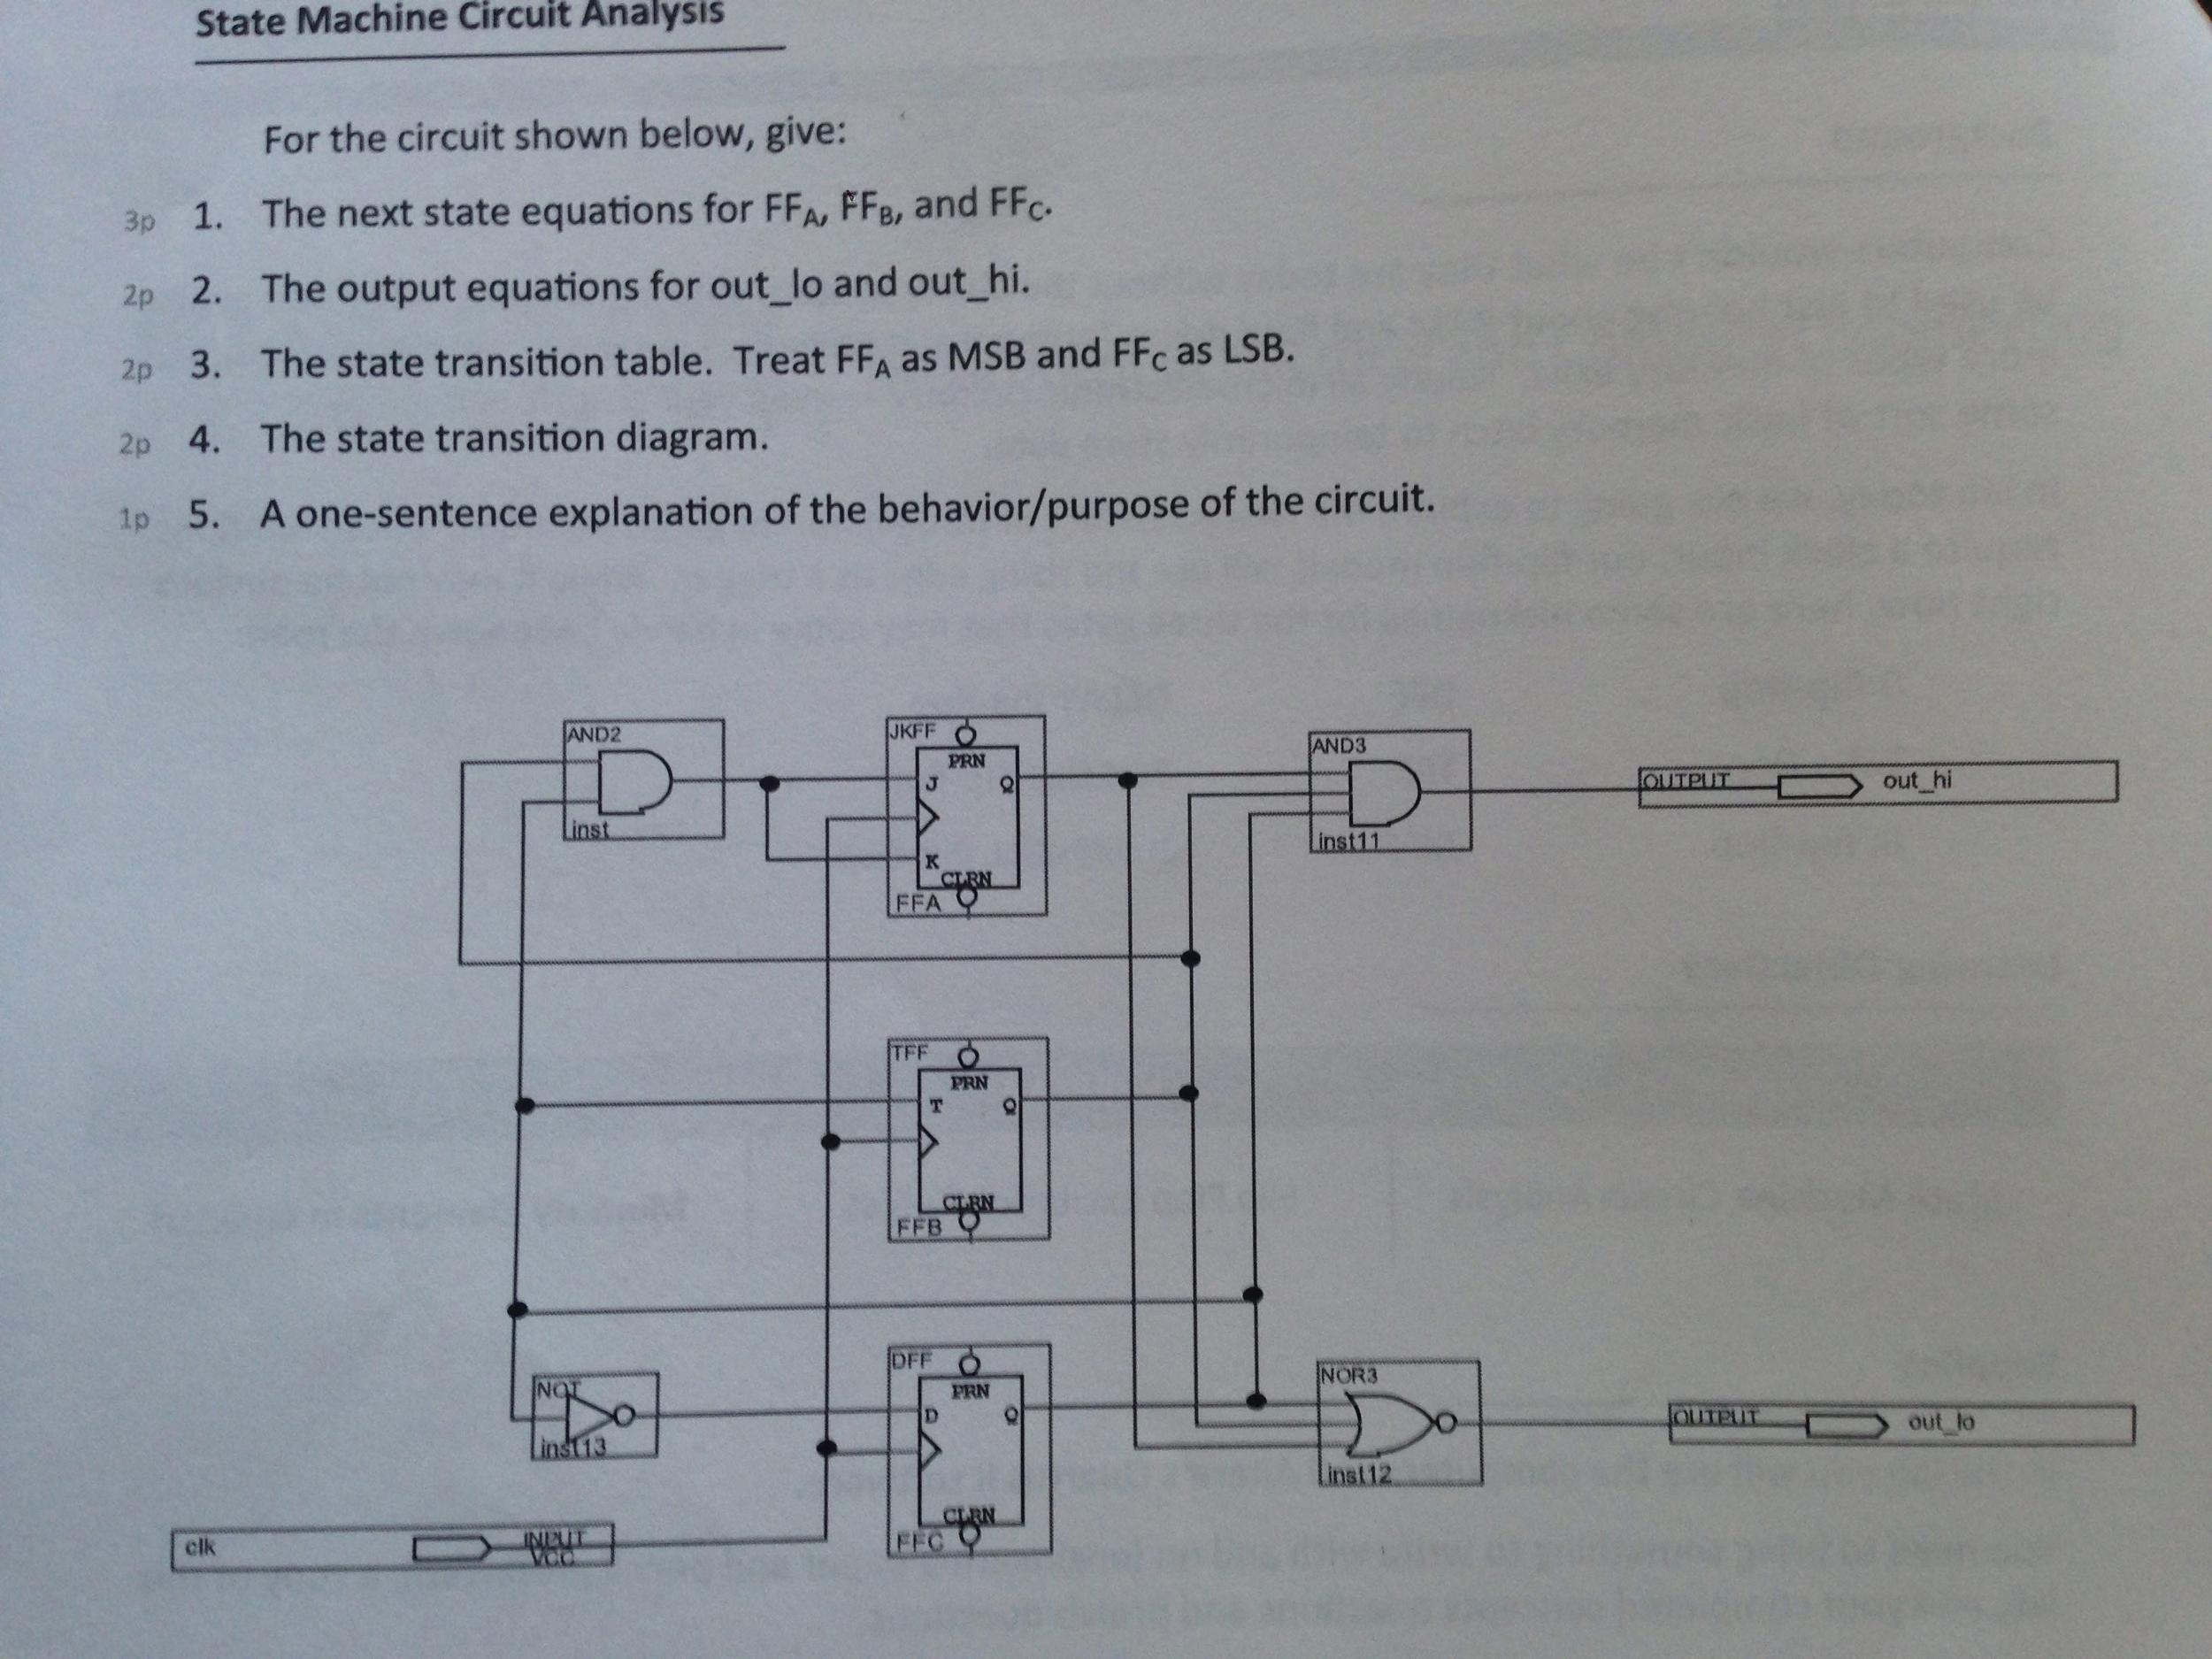 State Machine Circuit Analysis For The Circuit Sho... | Chegg.com